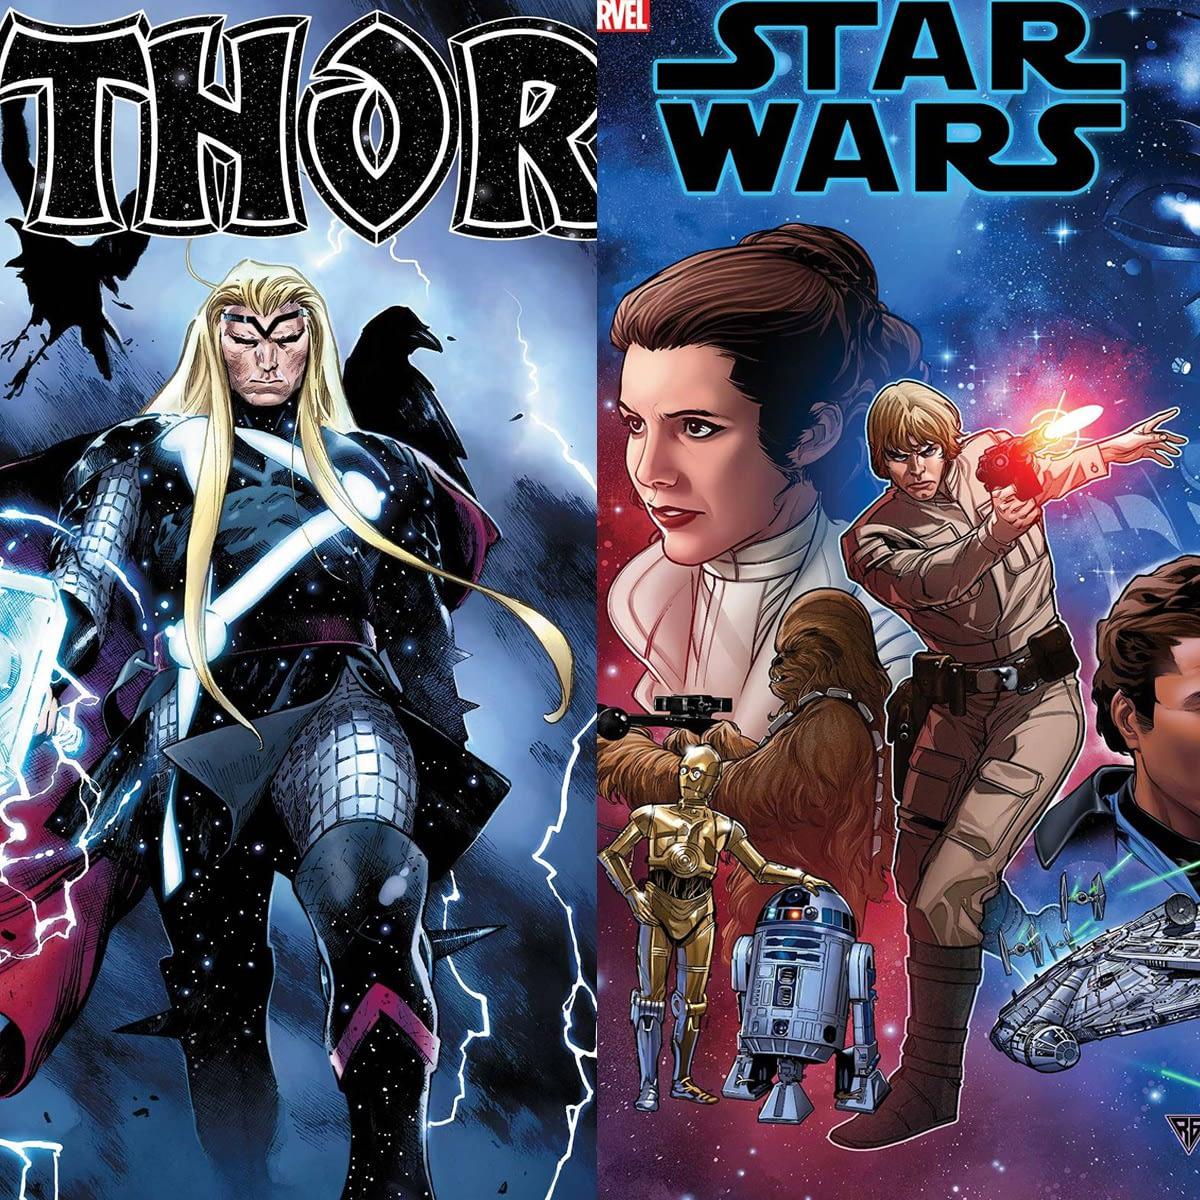 Thor / Star Wars